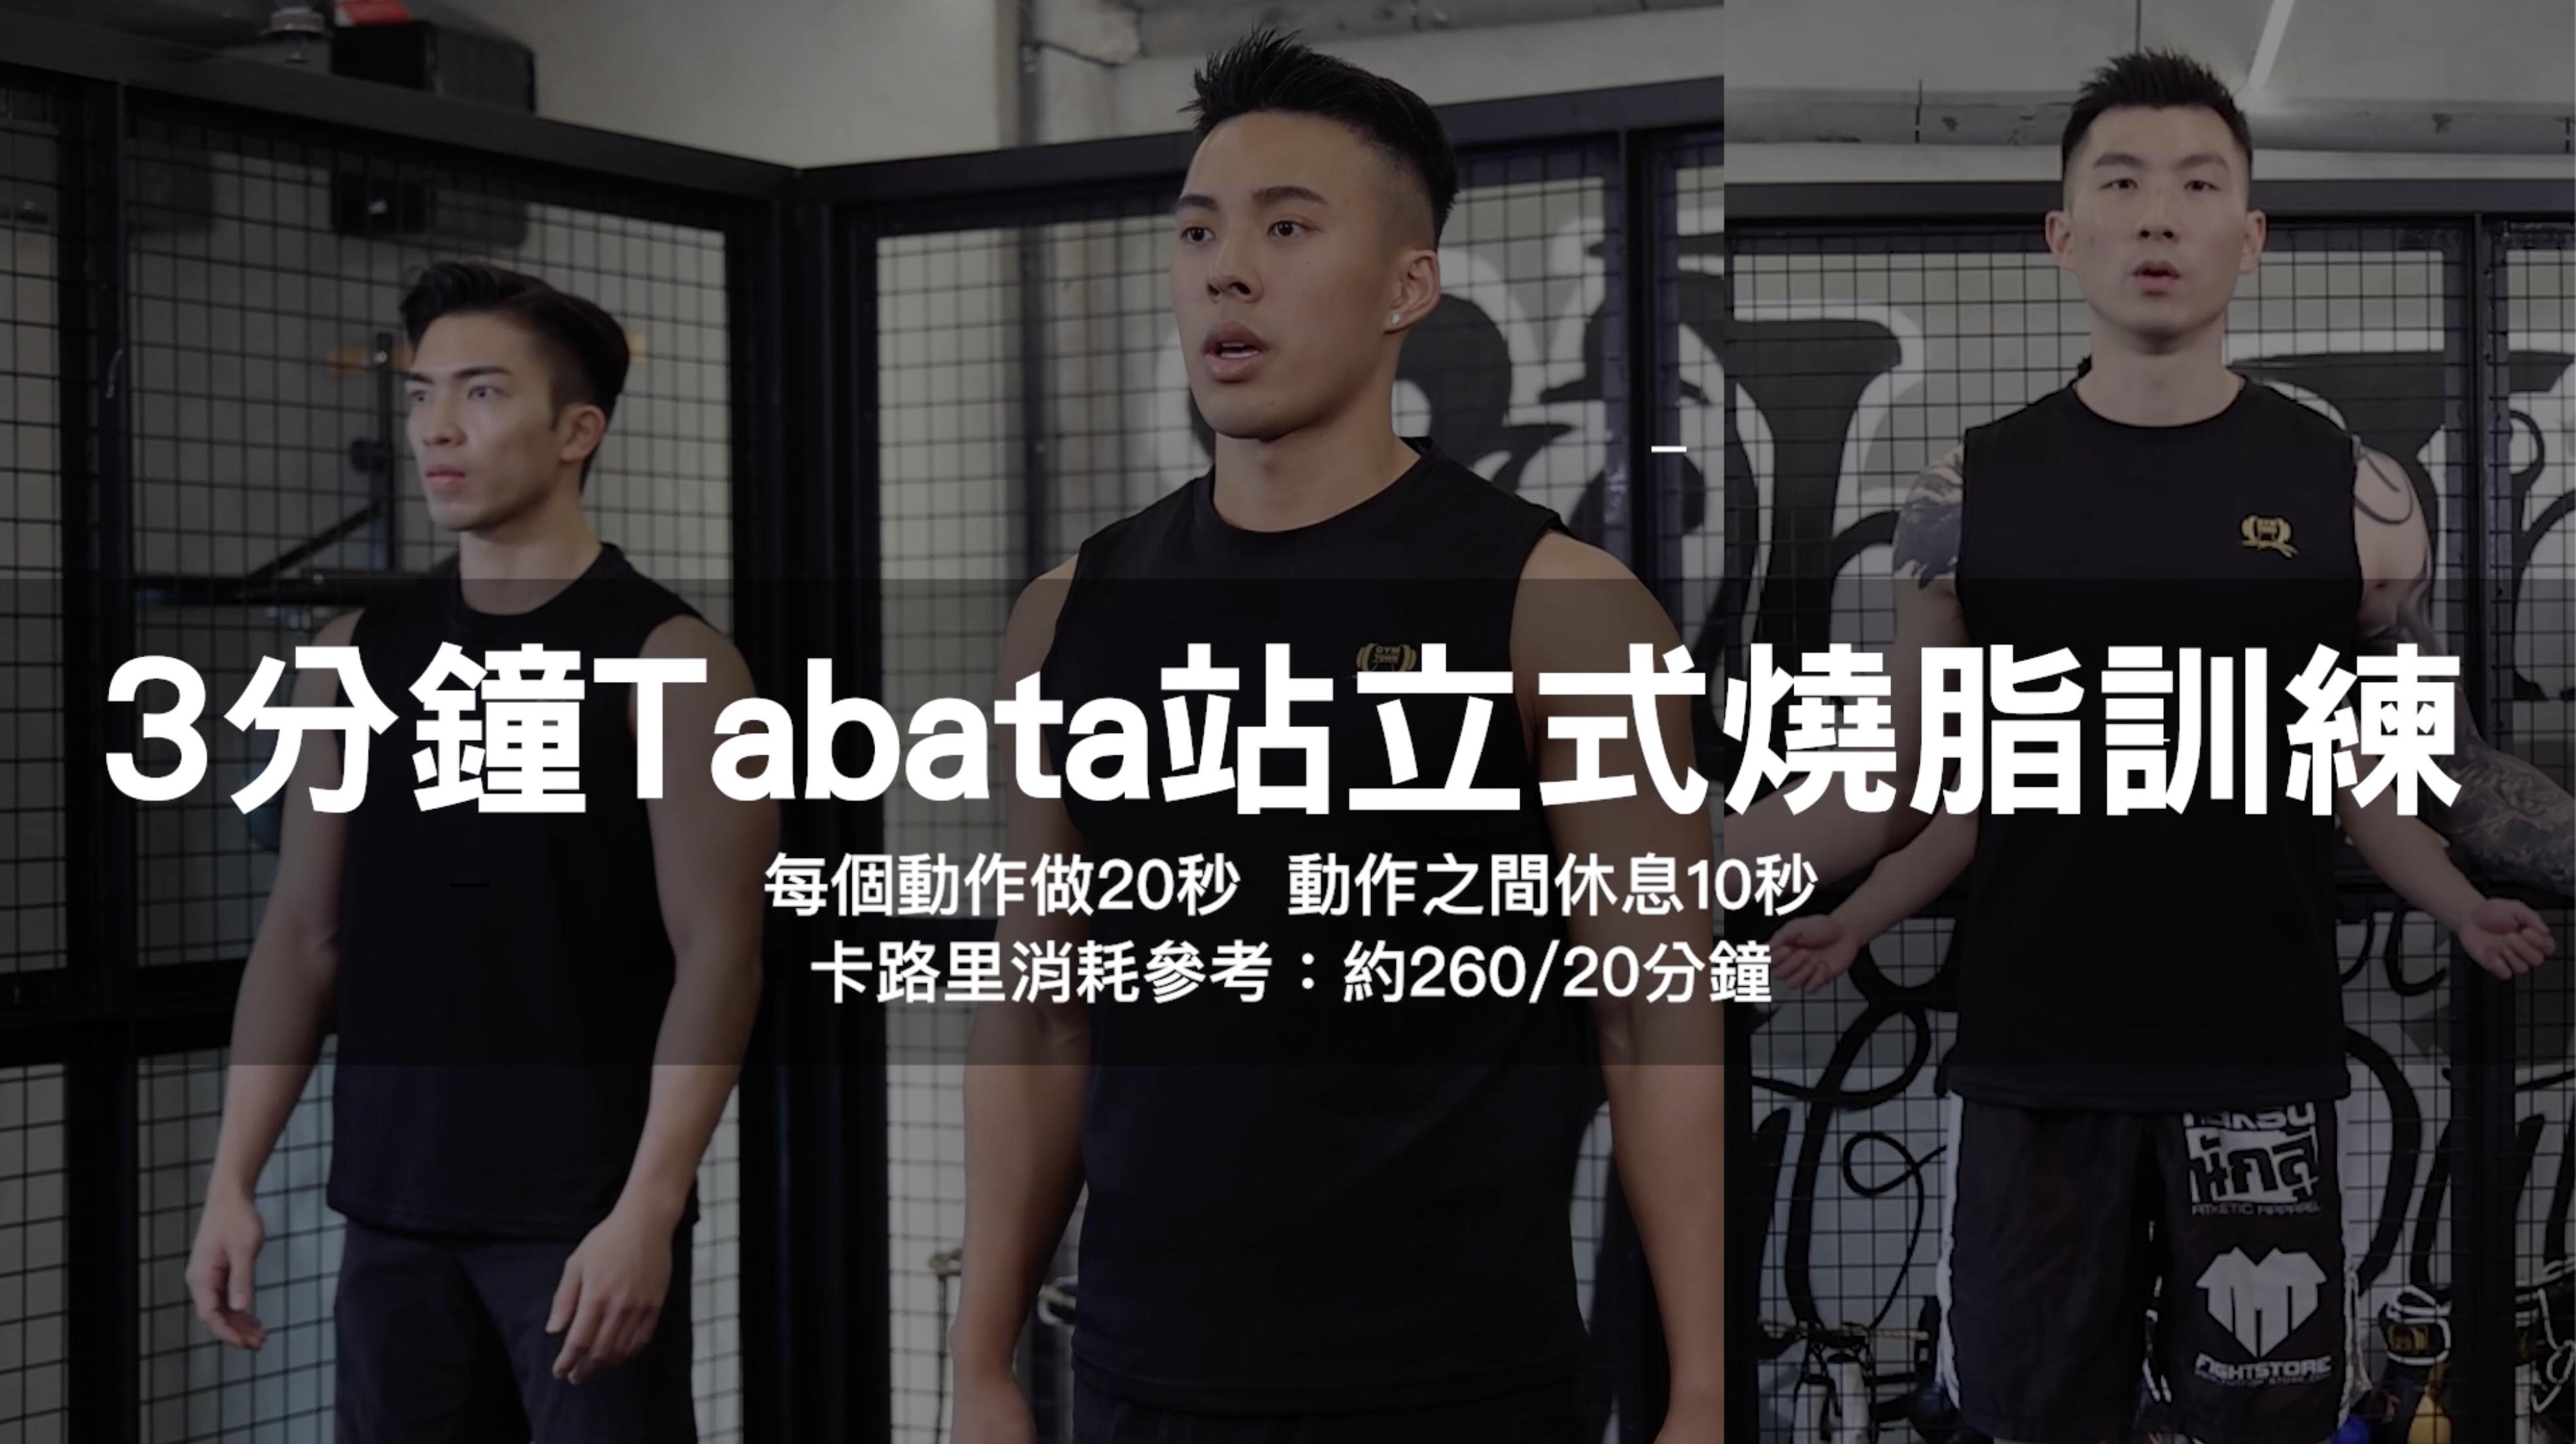 【SSwagger Academy - PT League】3分鐘Tabata站立式燒脂訓練